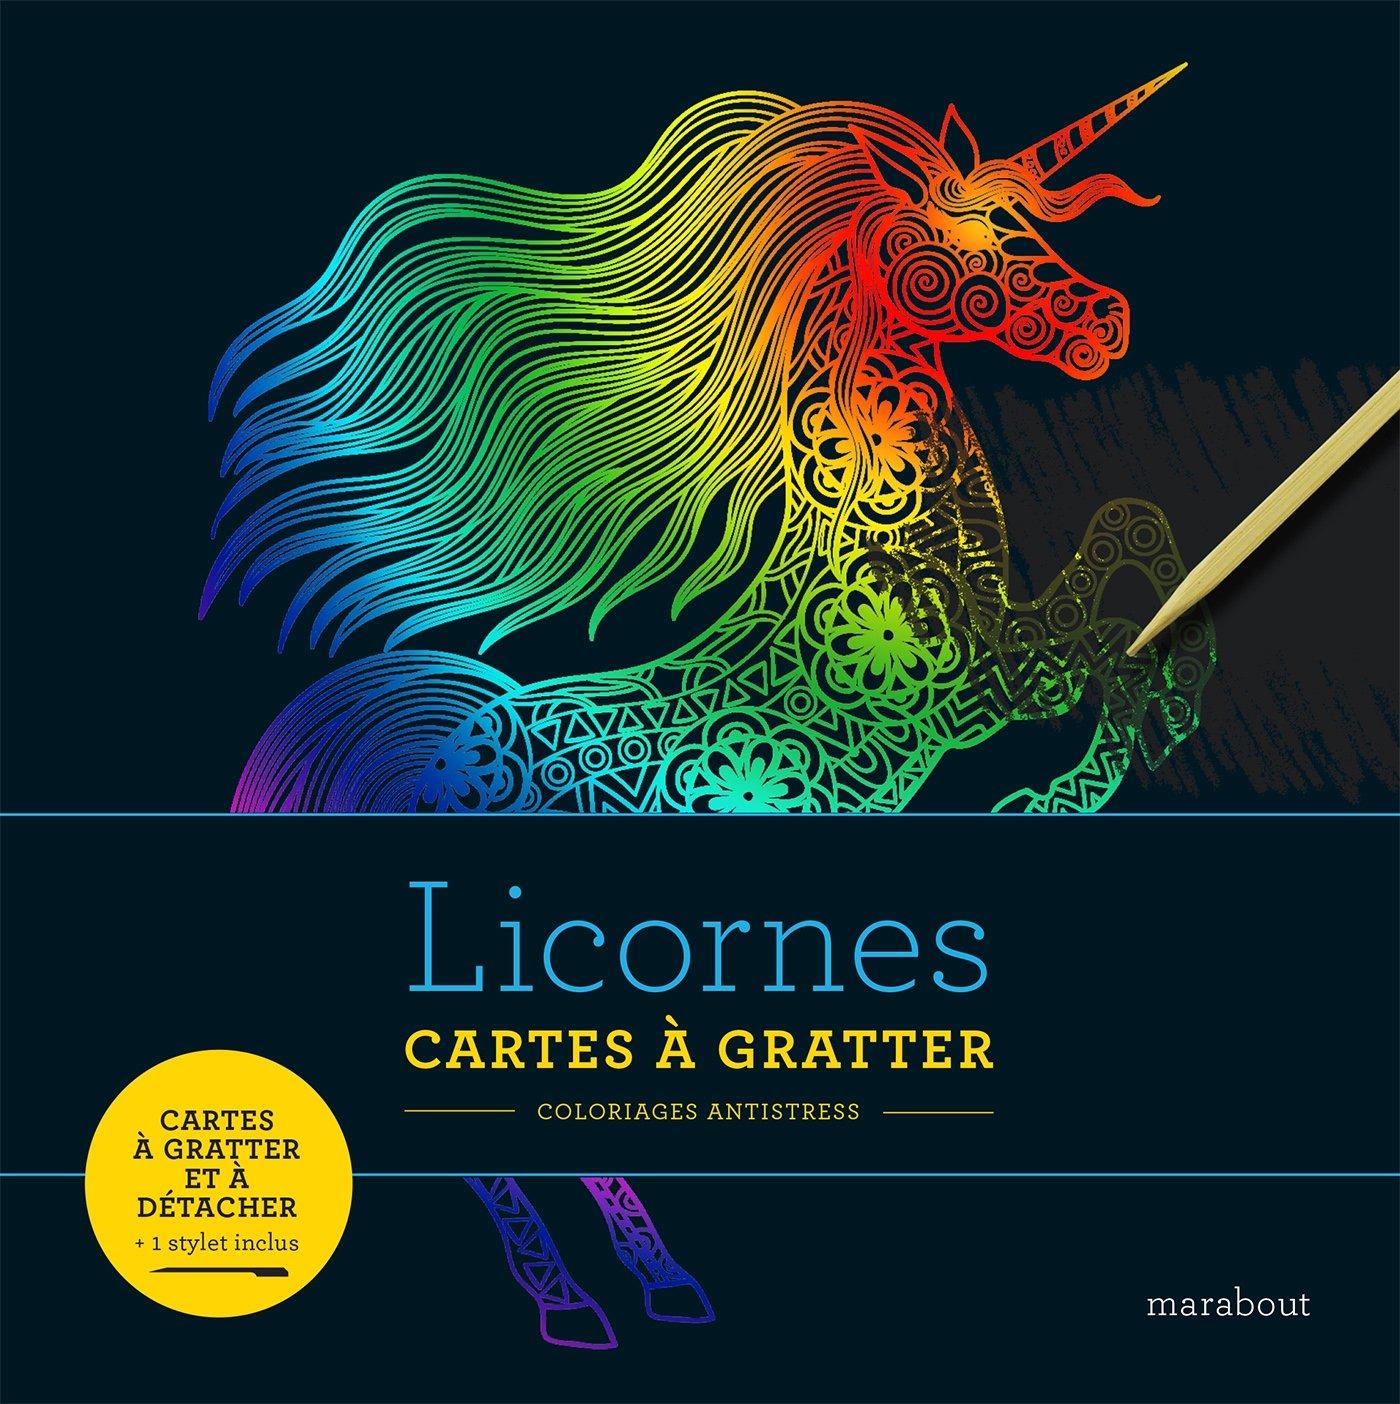 Coloriage Licorne Cultura.Amazon Fr Livre A Gratter Licorne Collectif Livres